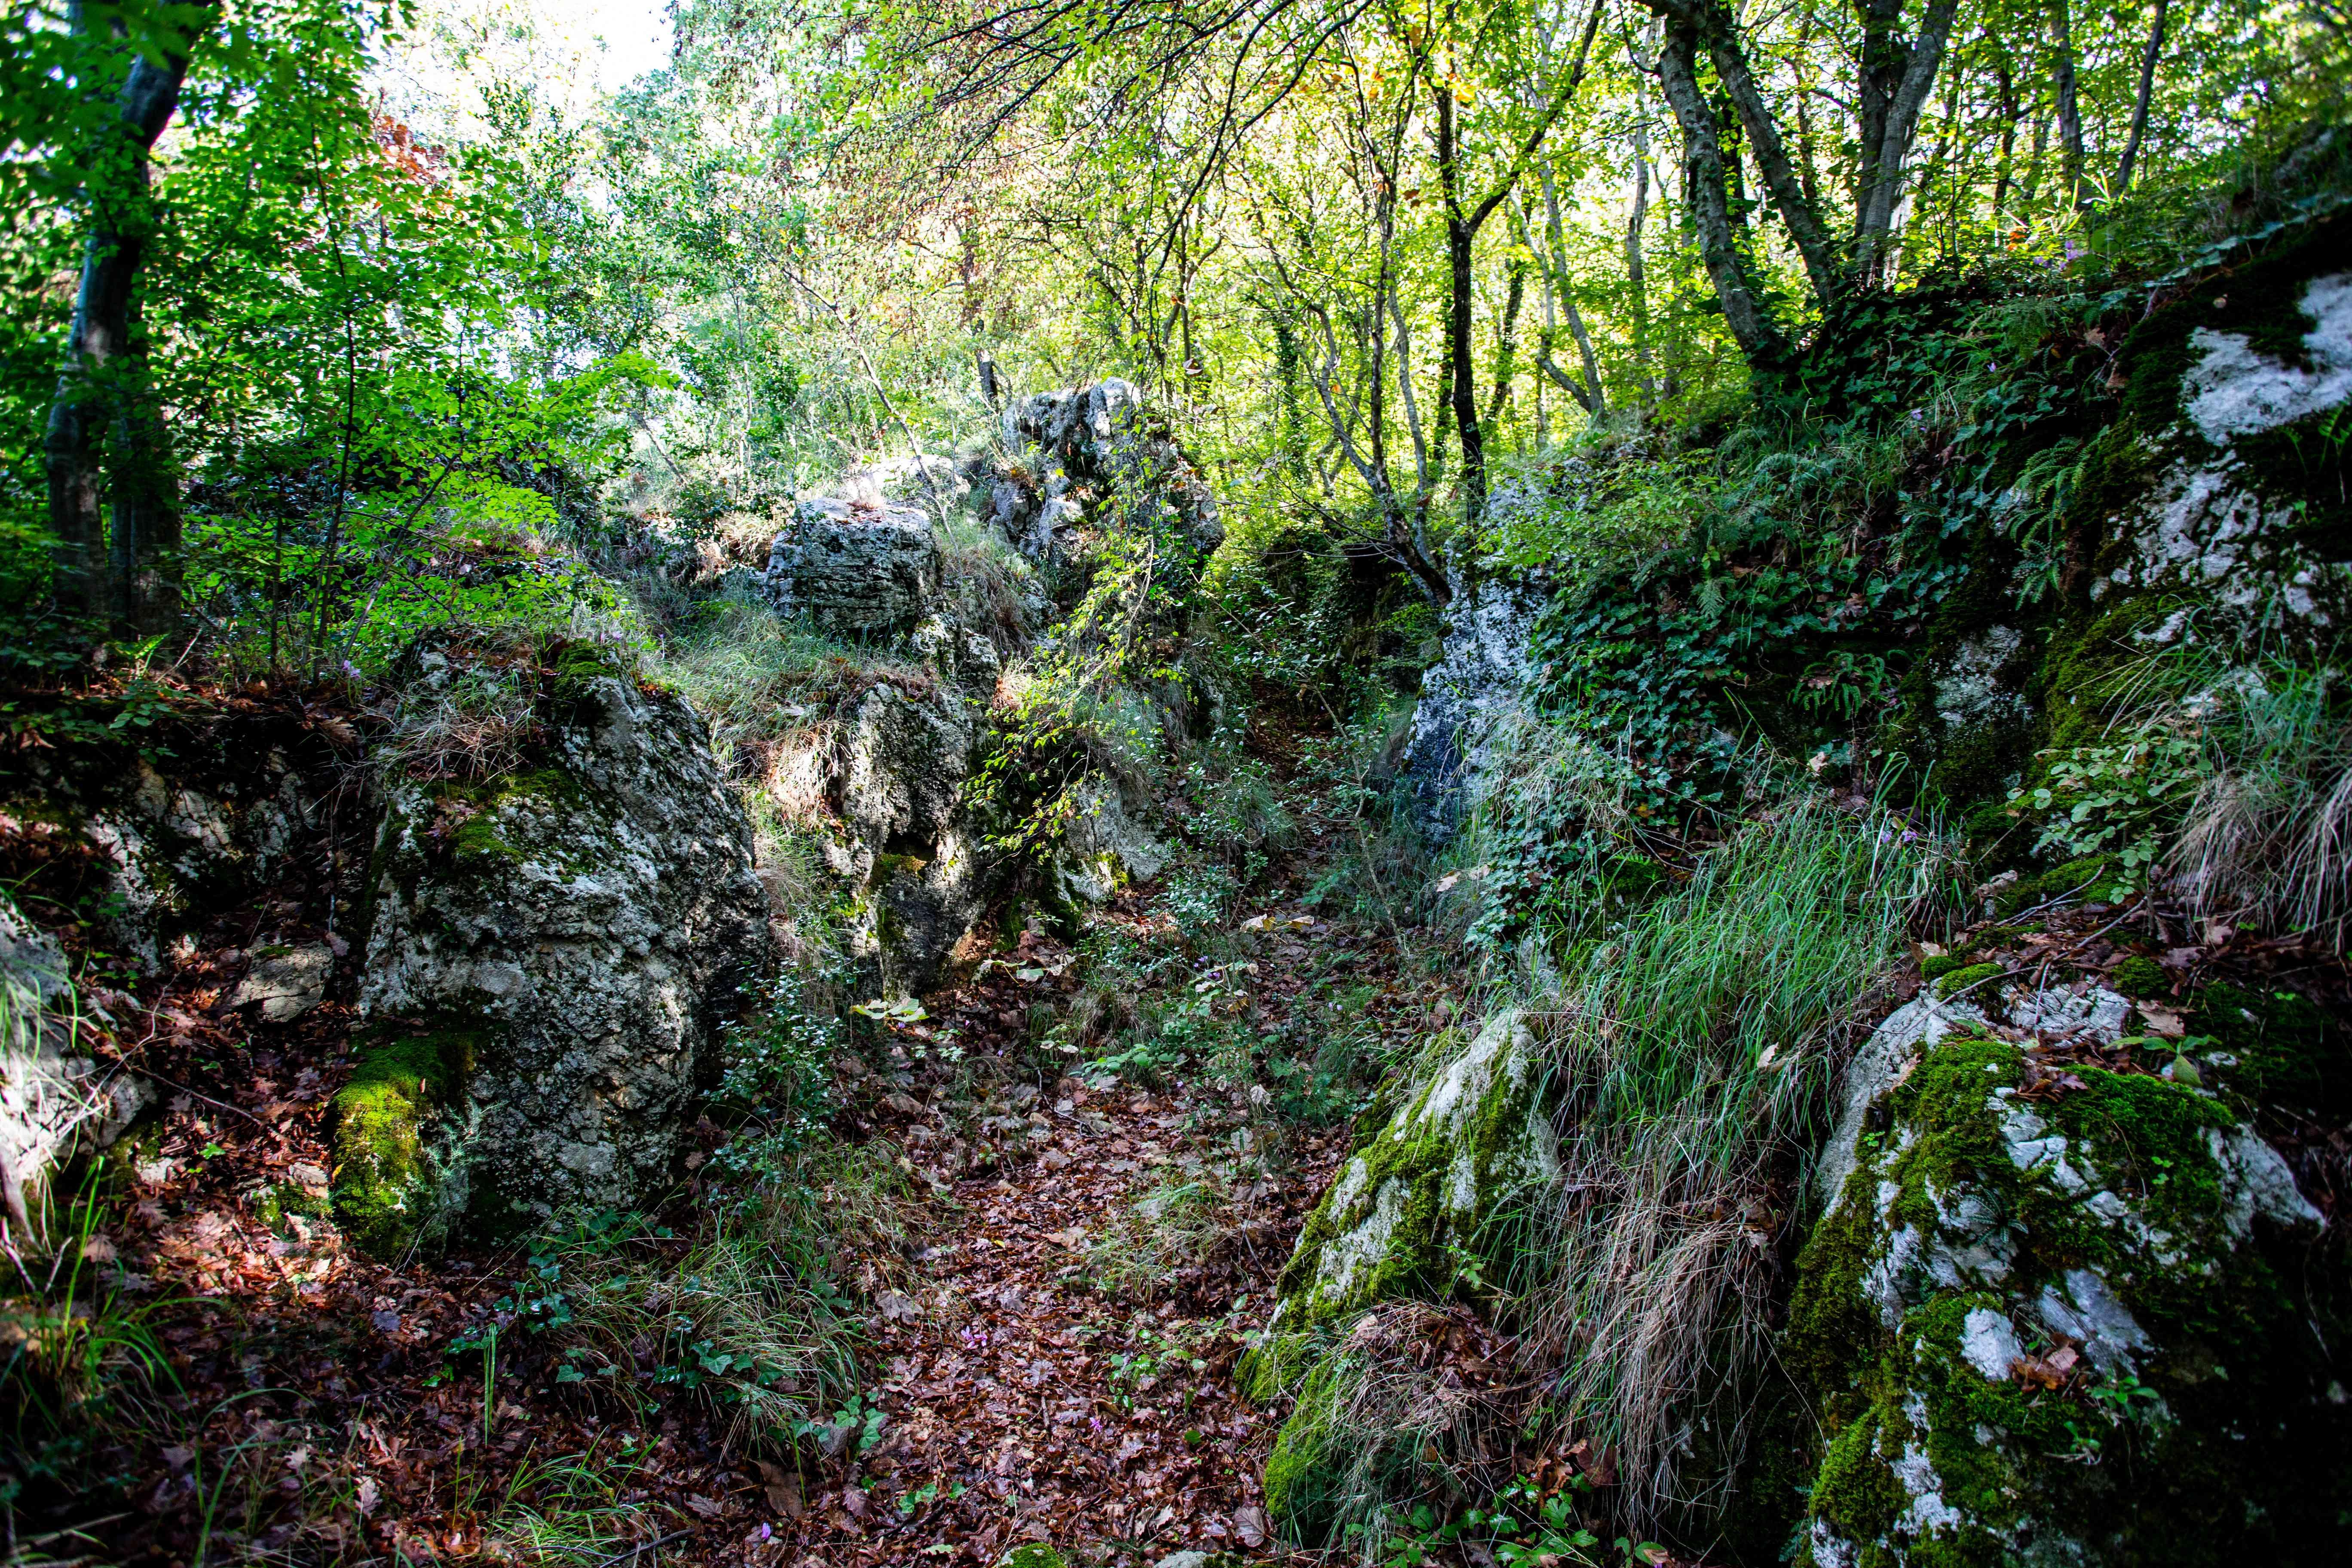 Parco Naturale Diecimare in Salerno, Italy